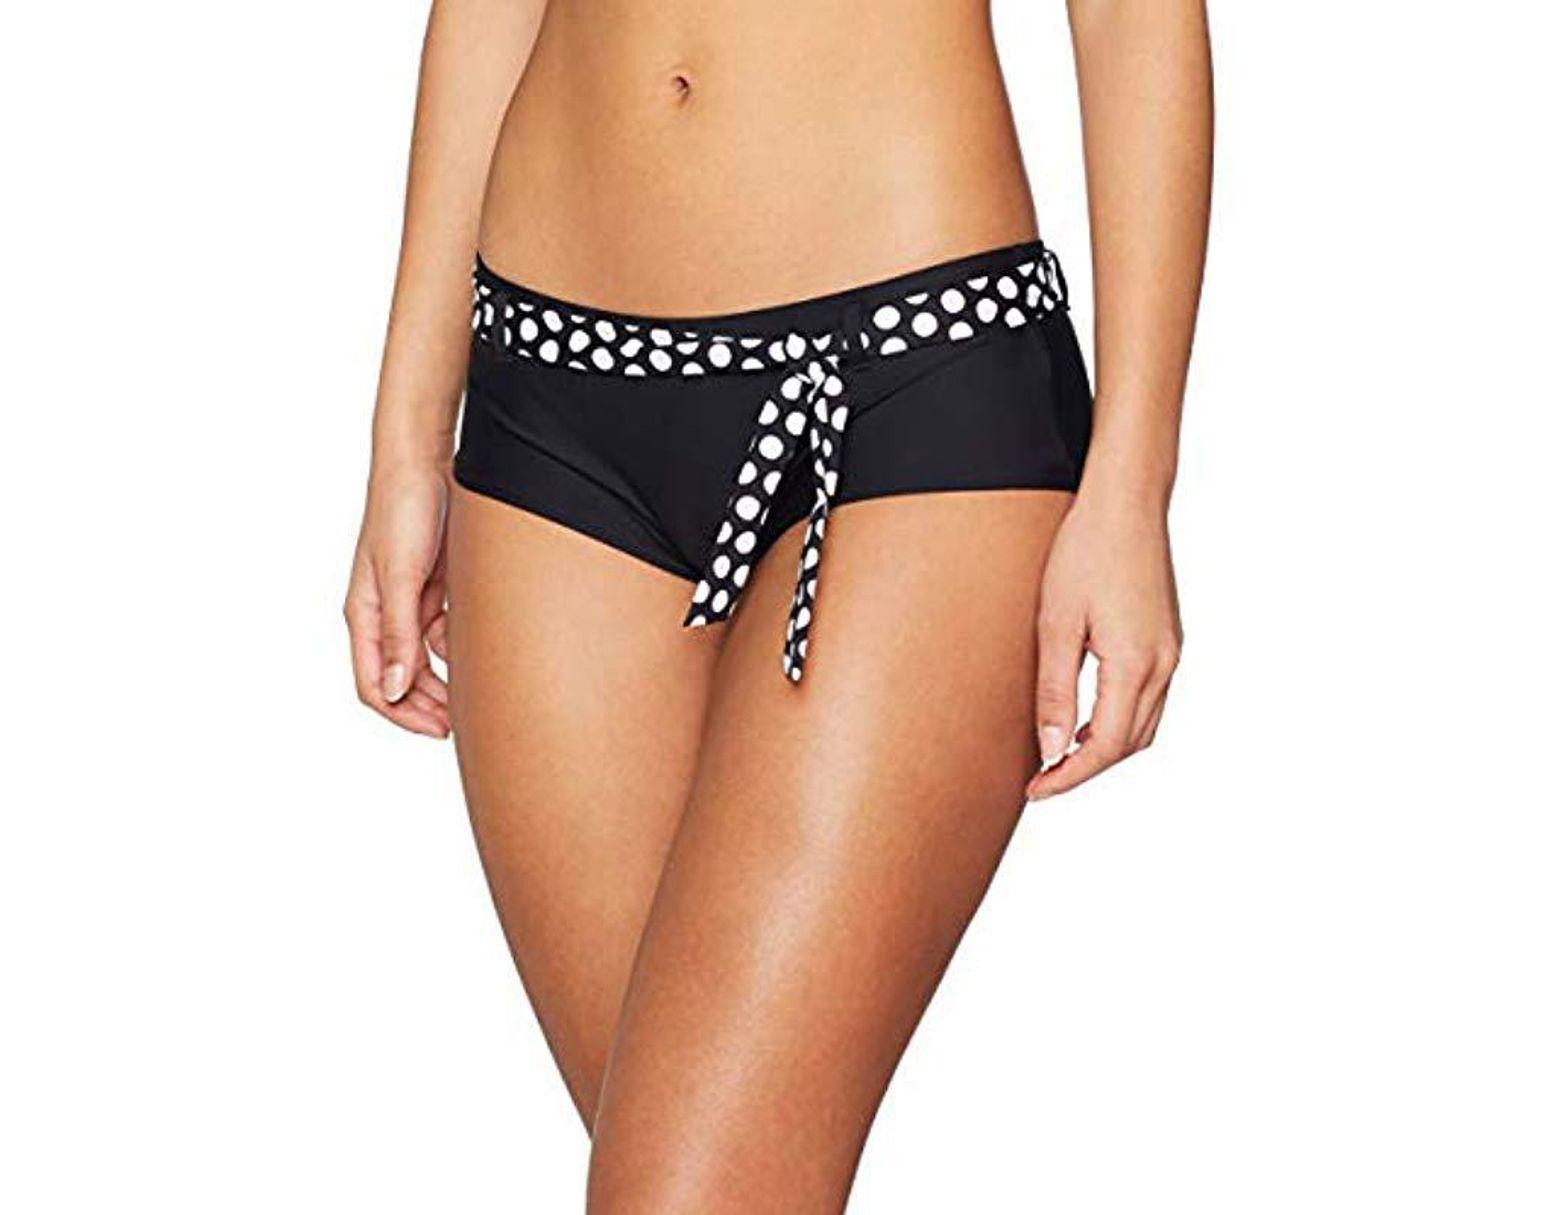 505a43b54bec6 Women's Black Crosby Beach Hipster Shorts Bikini Bottoms